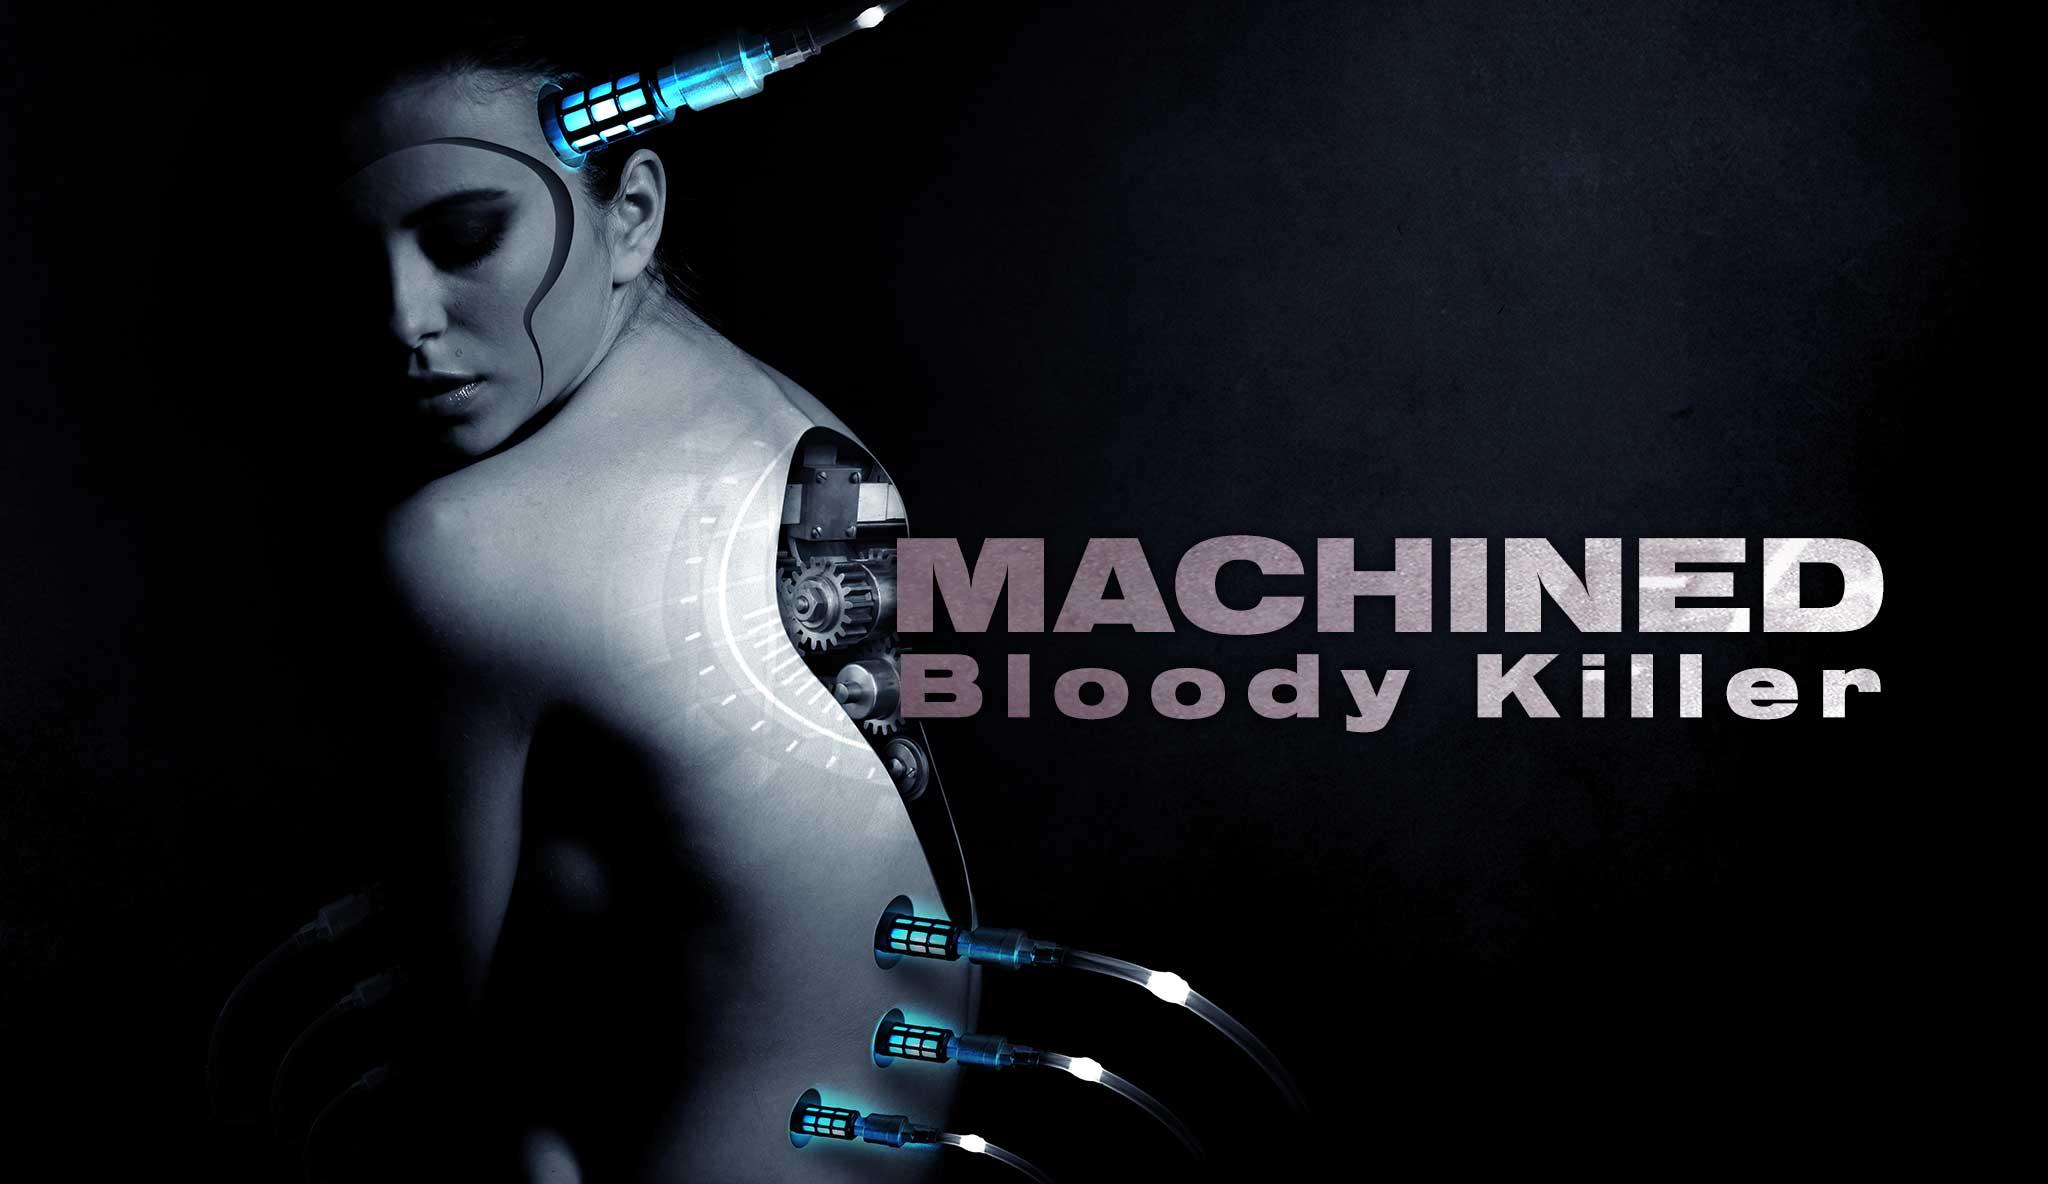 machined-bloody-killer\header.jpg